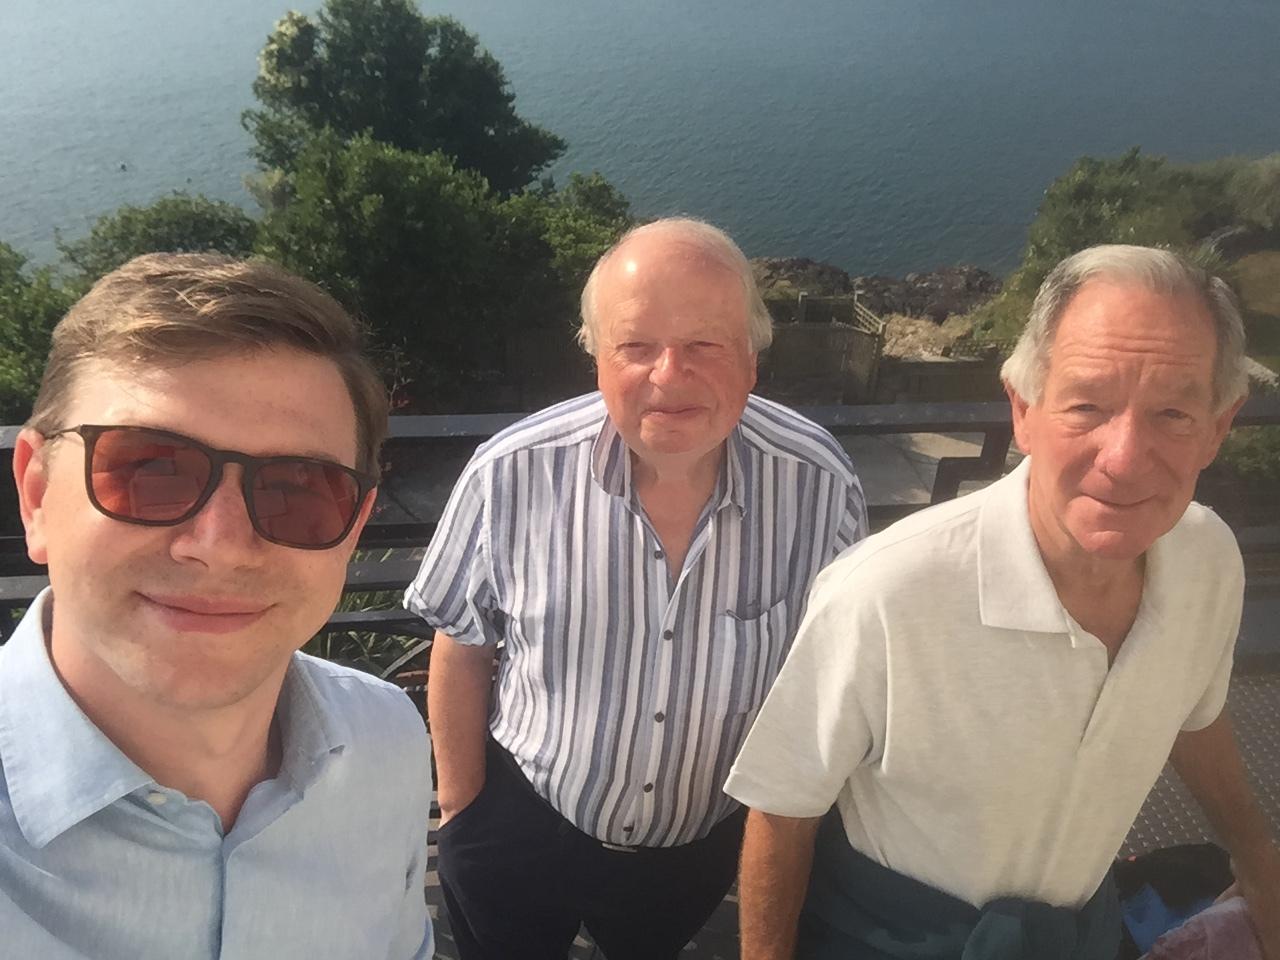 Britain By Boat with John Sergeant & Michael Buerk | Channel 5